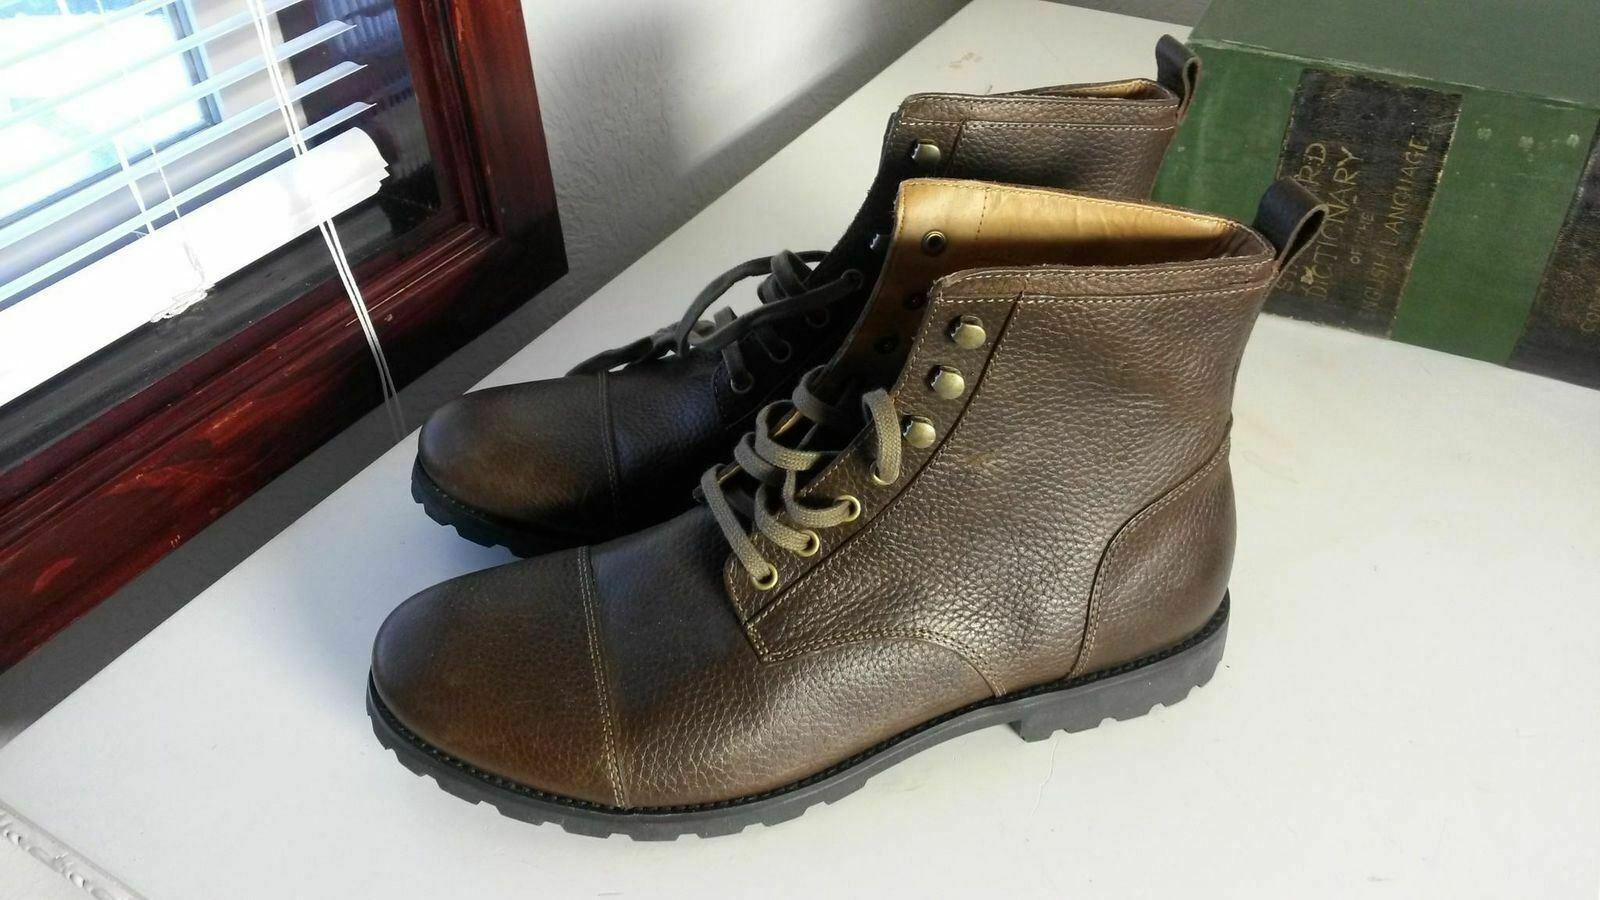 FOSSIL Low Men's Brown Leather Boots FFM7030200 SZ 13 (FS013)